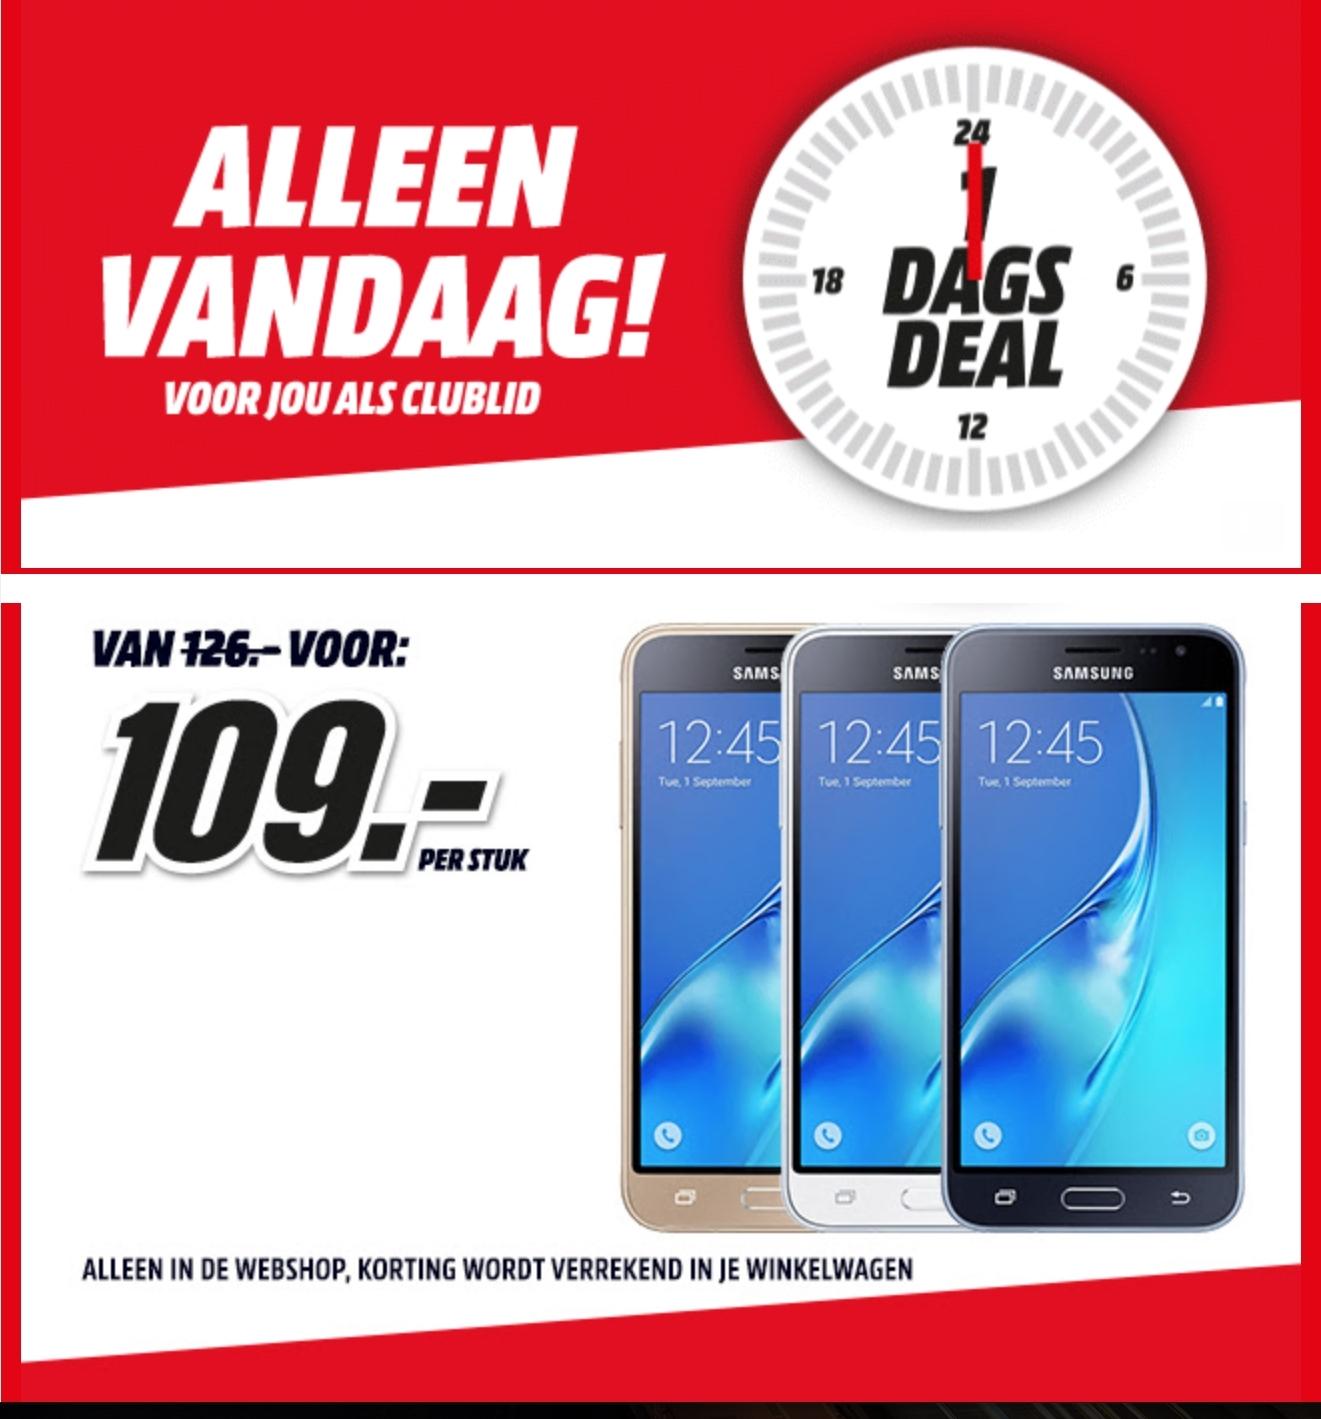 Samsung Galaxy J3 (2016) 4G, alleen vandaag voor jou als clublid - €109 @ Mediamarkt